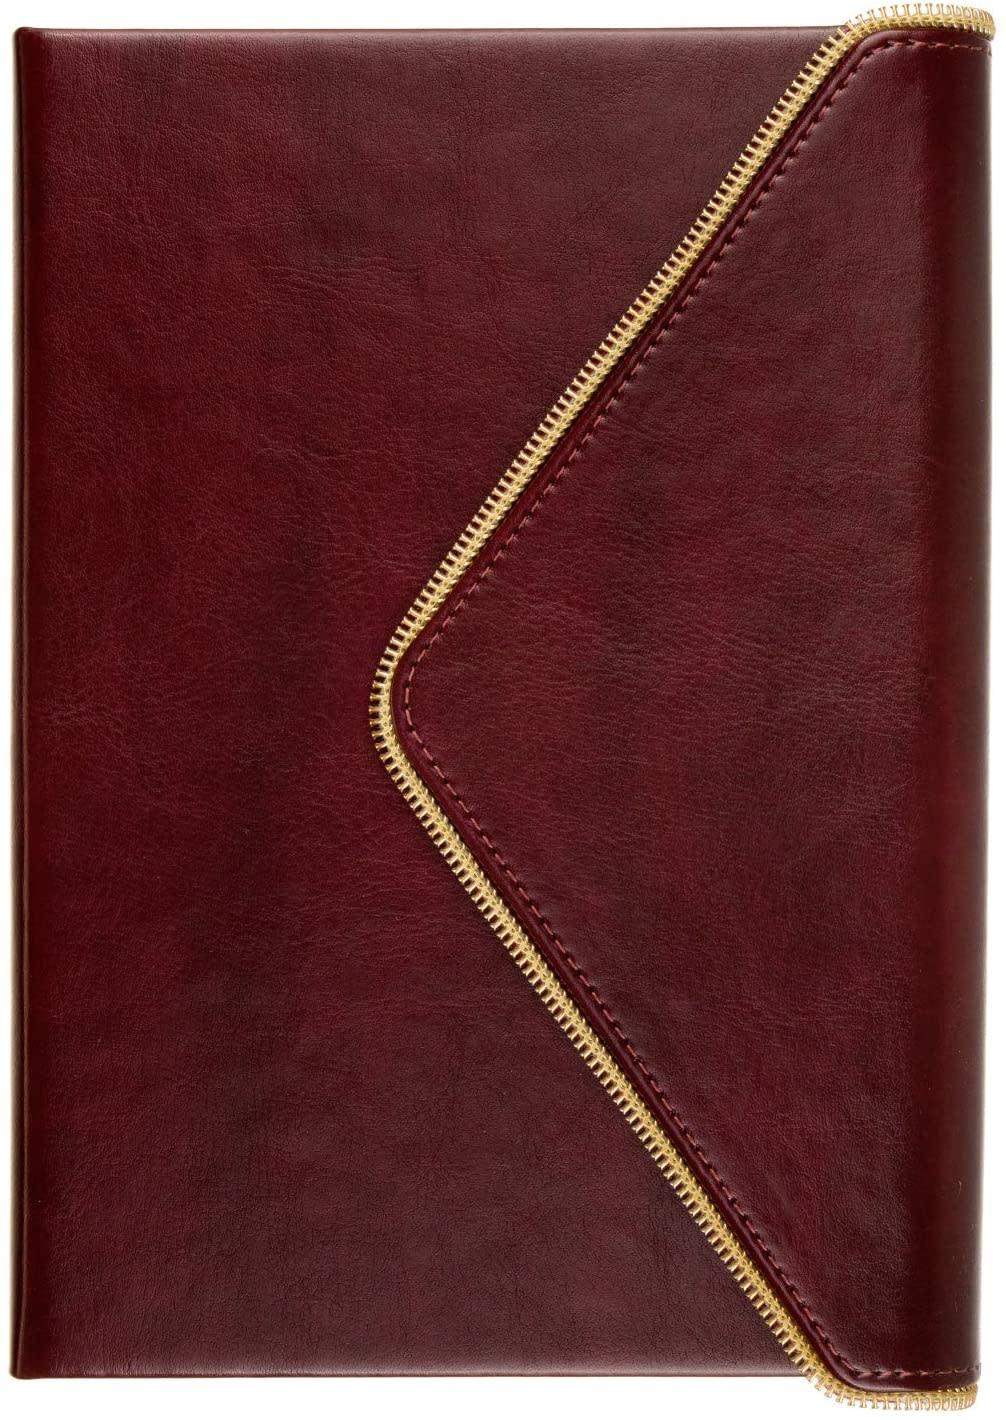 Journal Burgundy Envelope with Gold Zipper-3